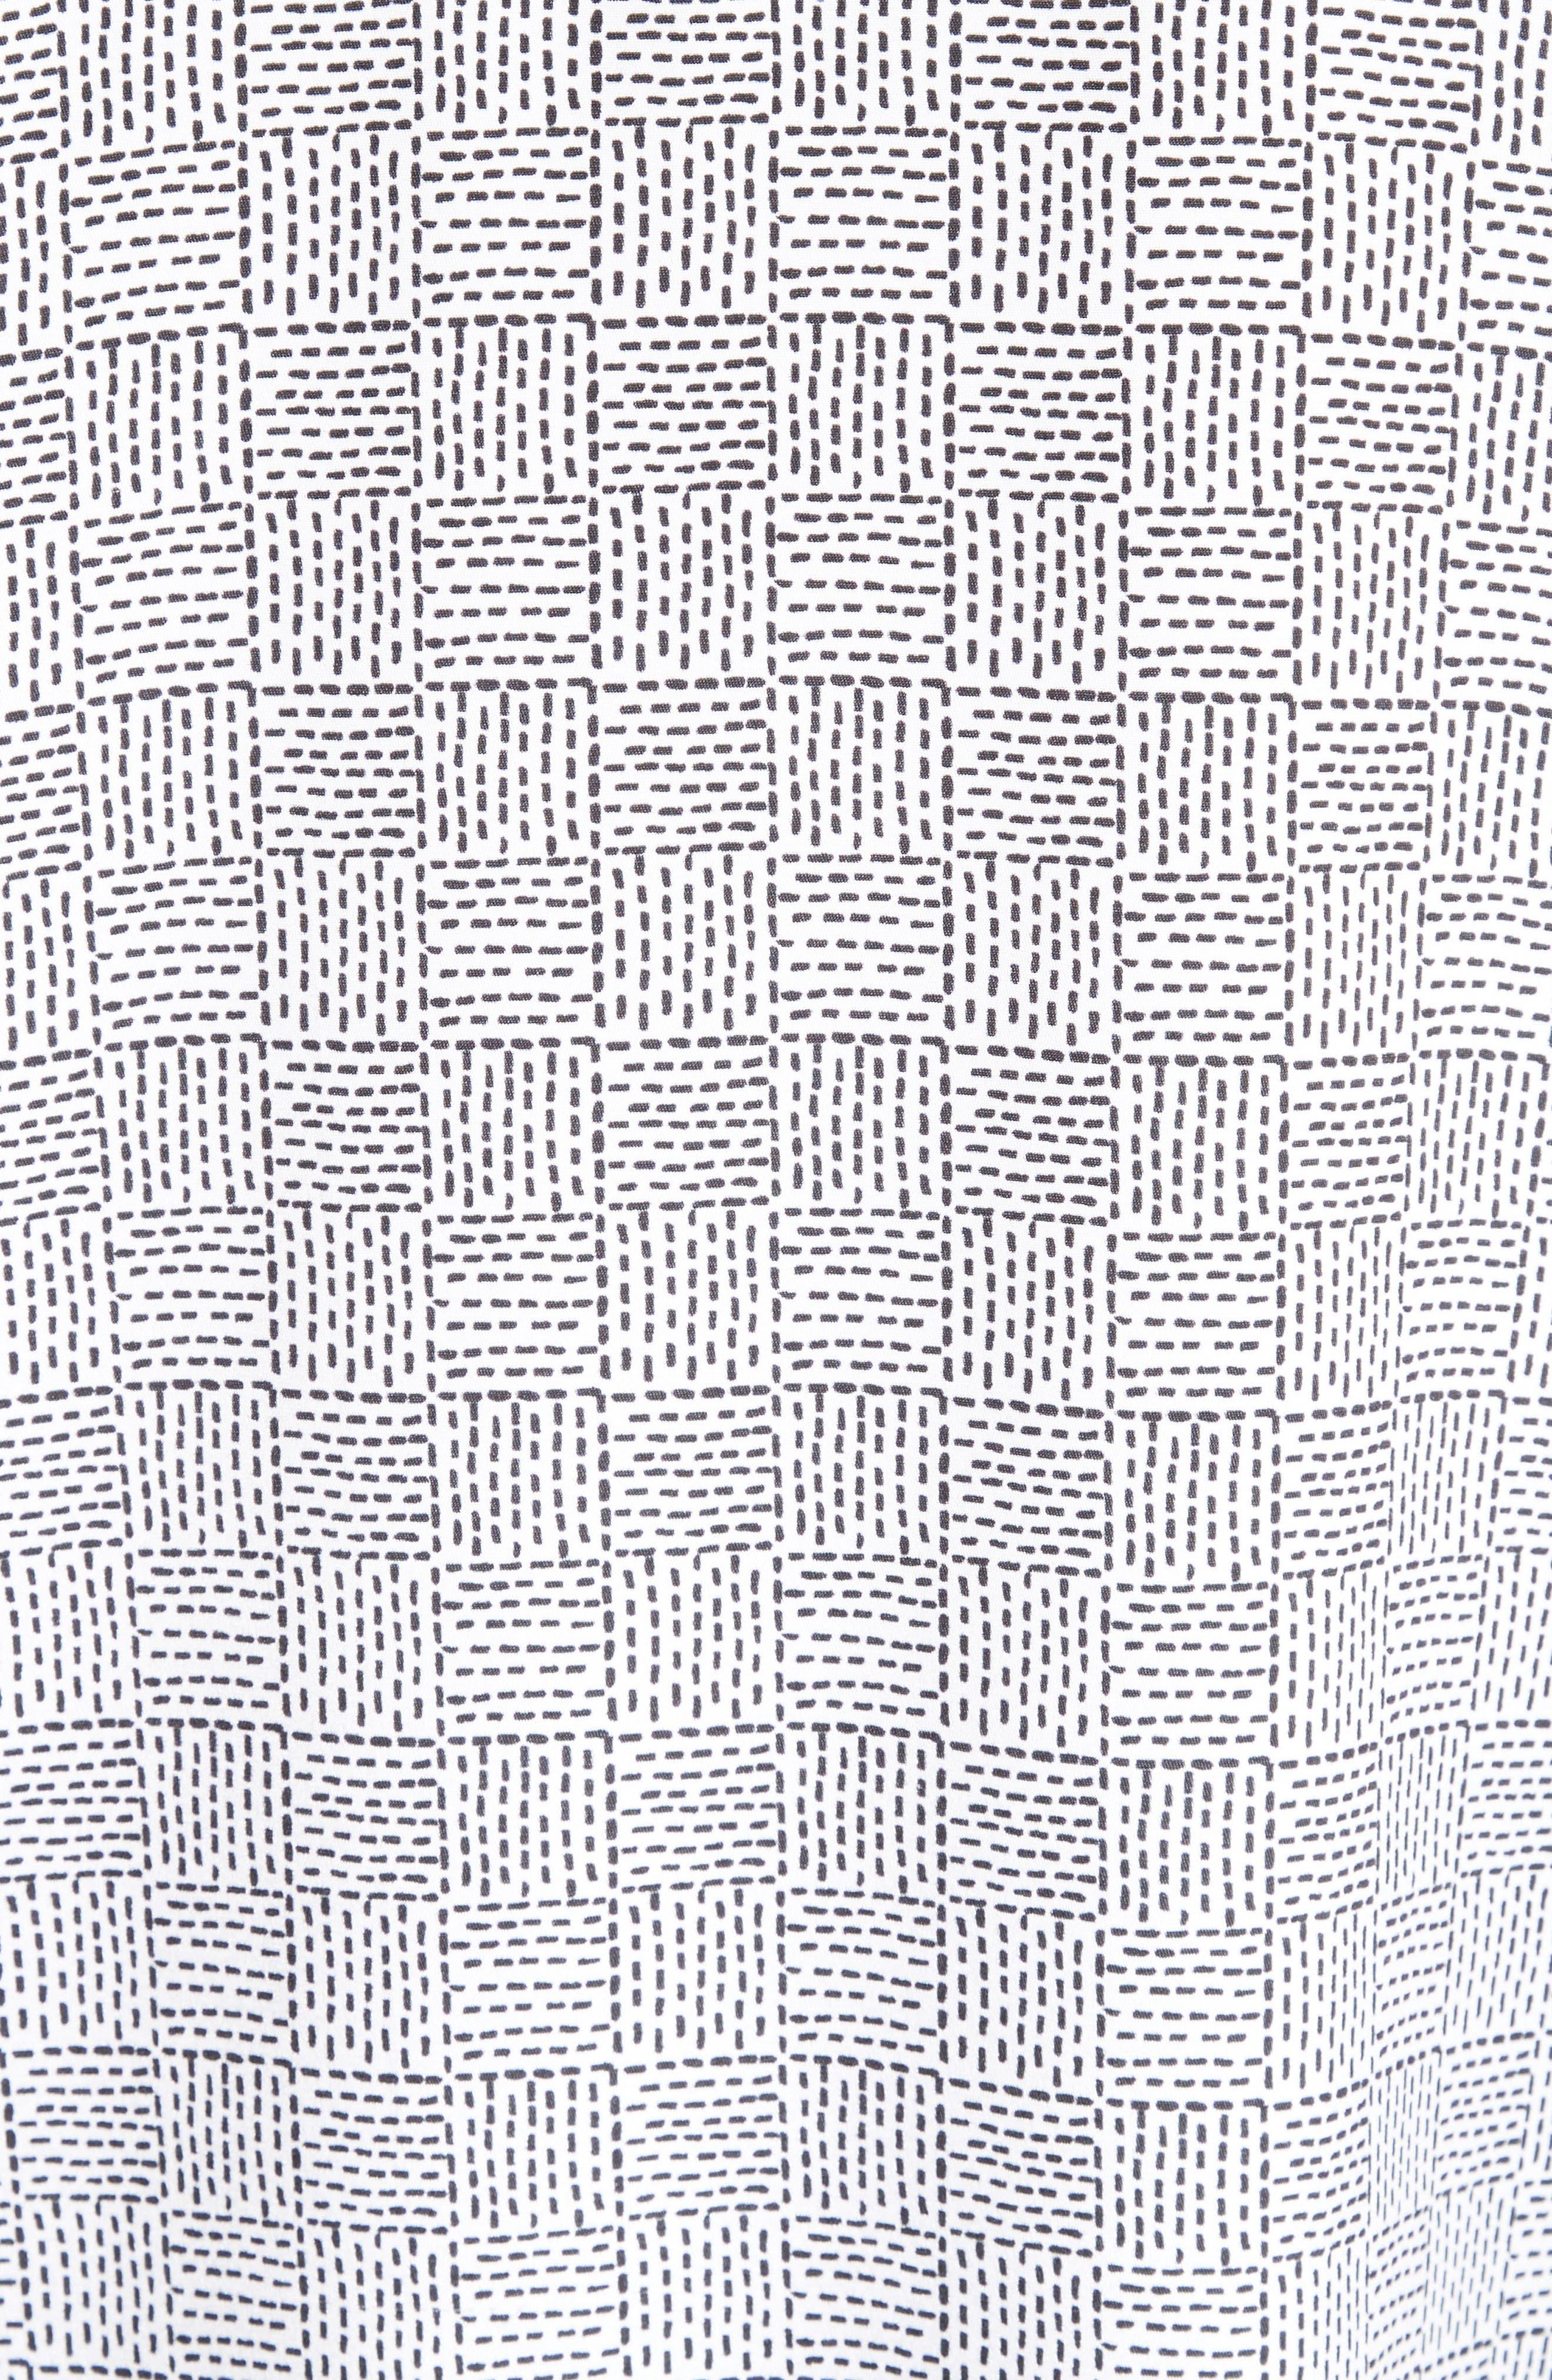 Stitch Print Stretch Silk Blouse,                             Alternate thumbnail 5, color,                             020